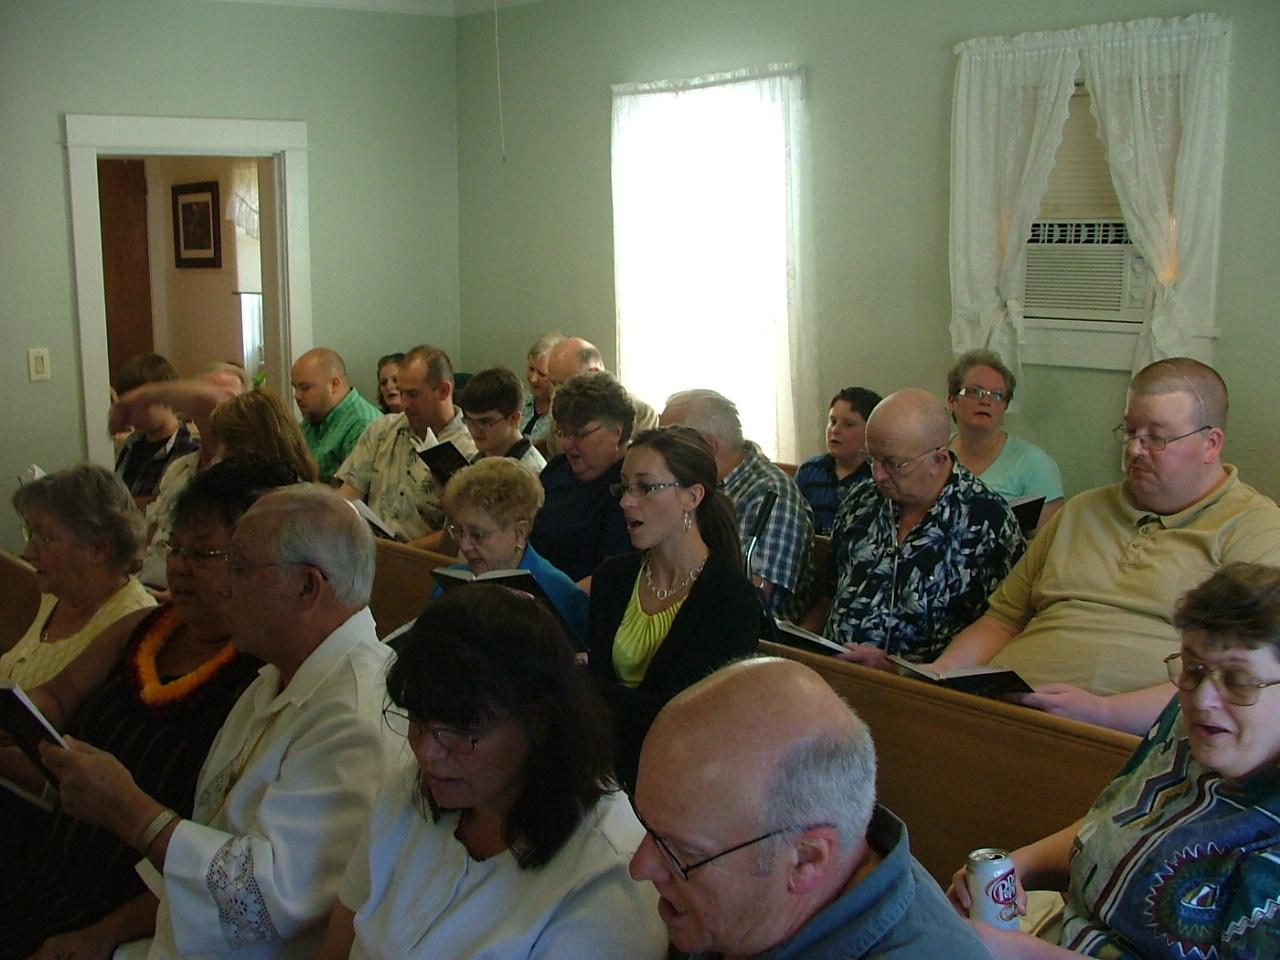 June 2010 - Annual Fellowship Meeting